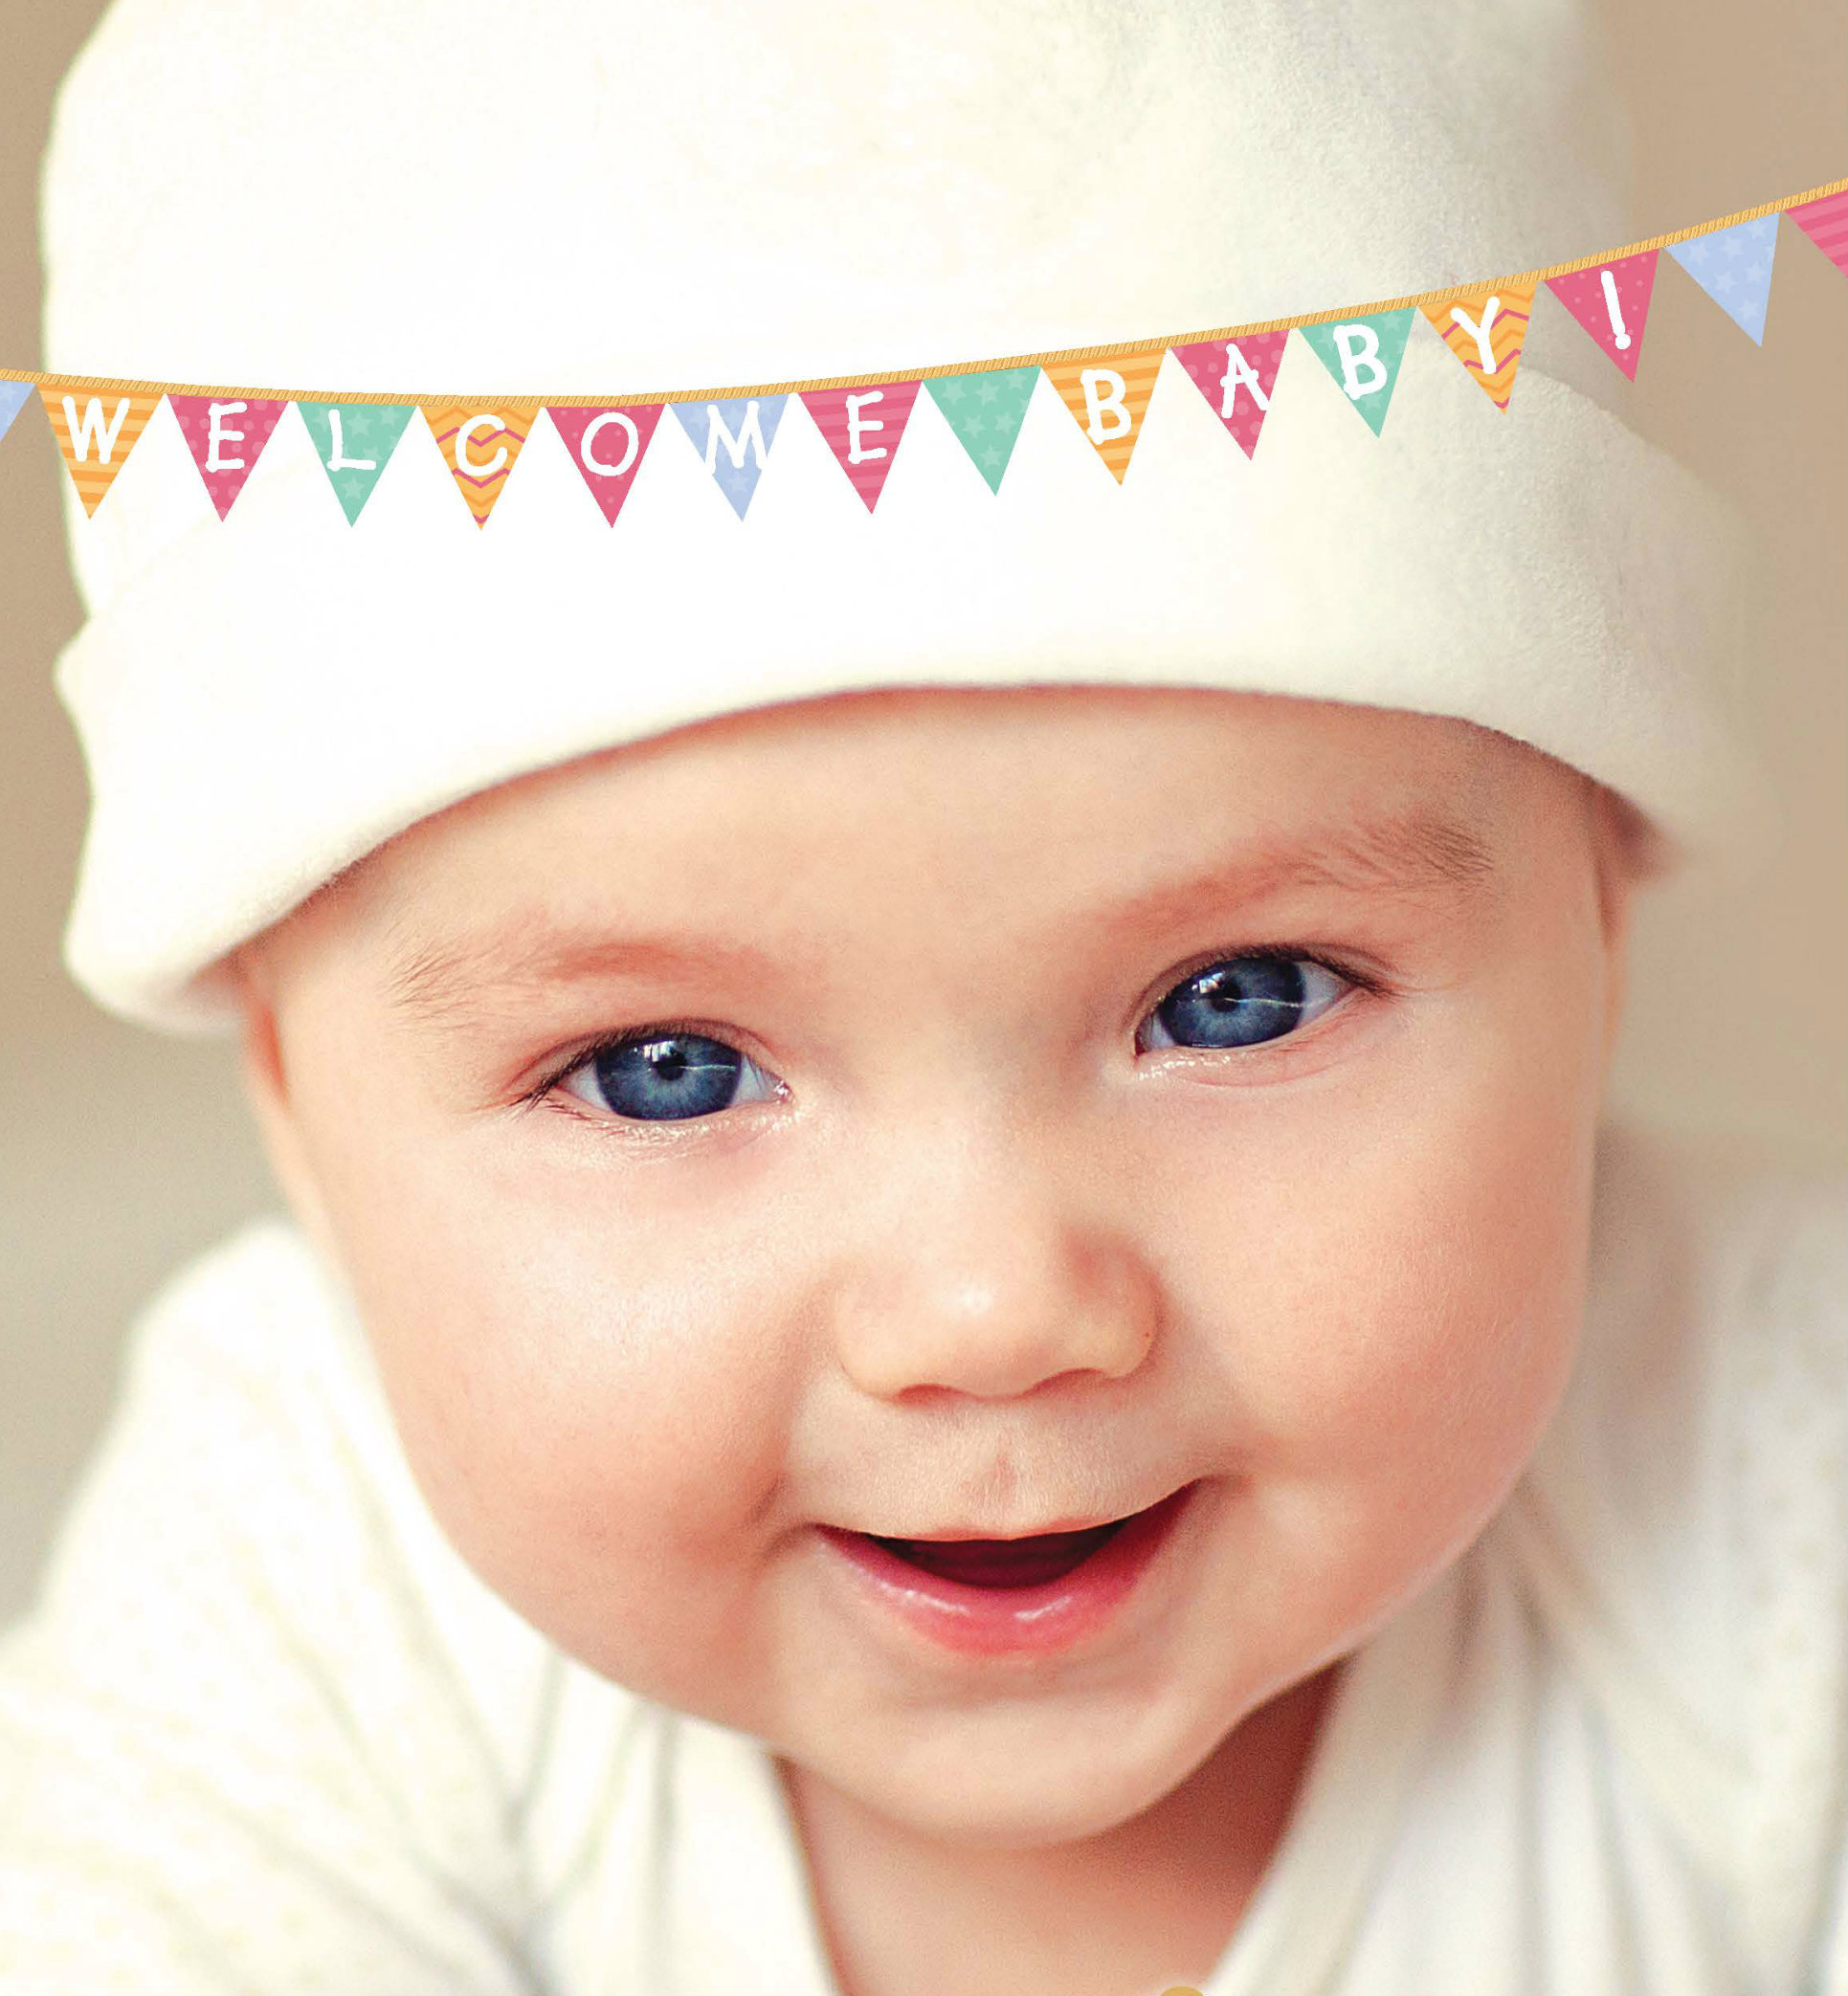 Baby Wall Face.jpg